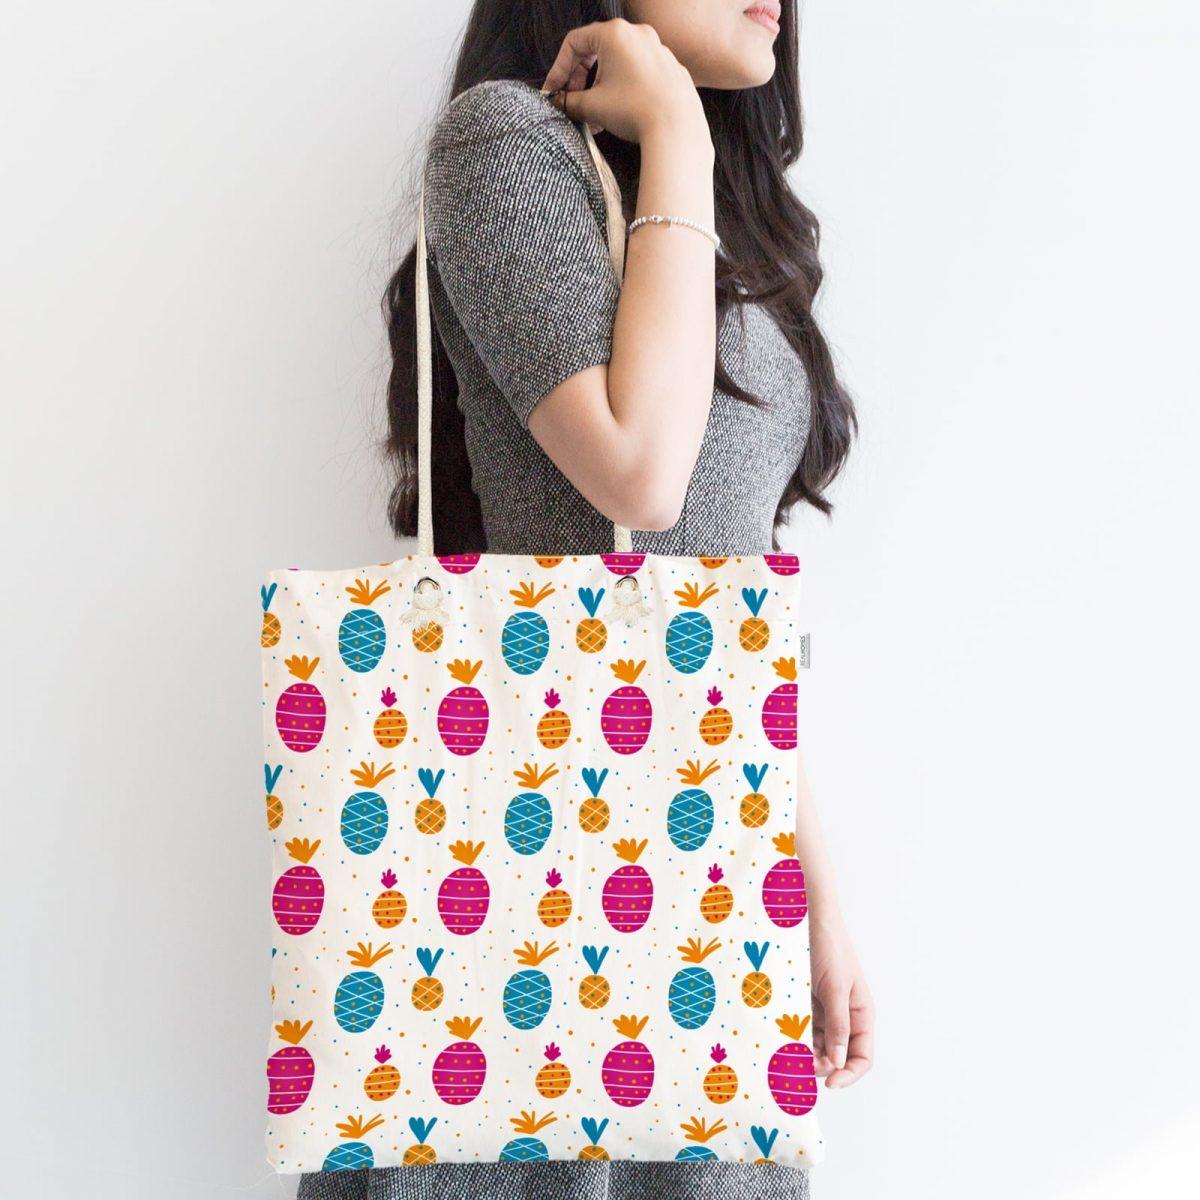 Renkli Ananas Motifli Dijital Baskılı Fermuarlı Kumaş Çanta Realhomes